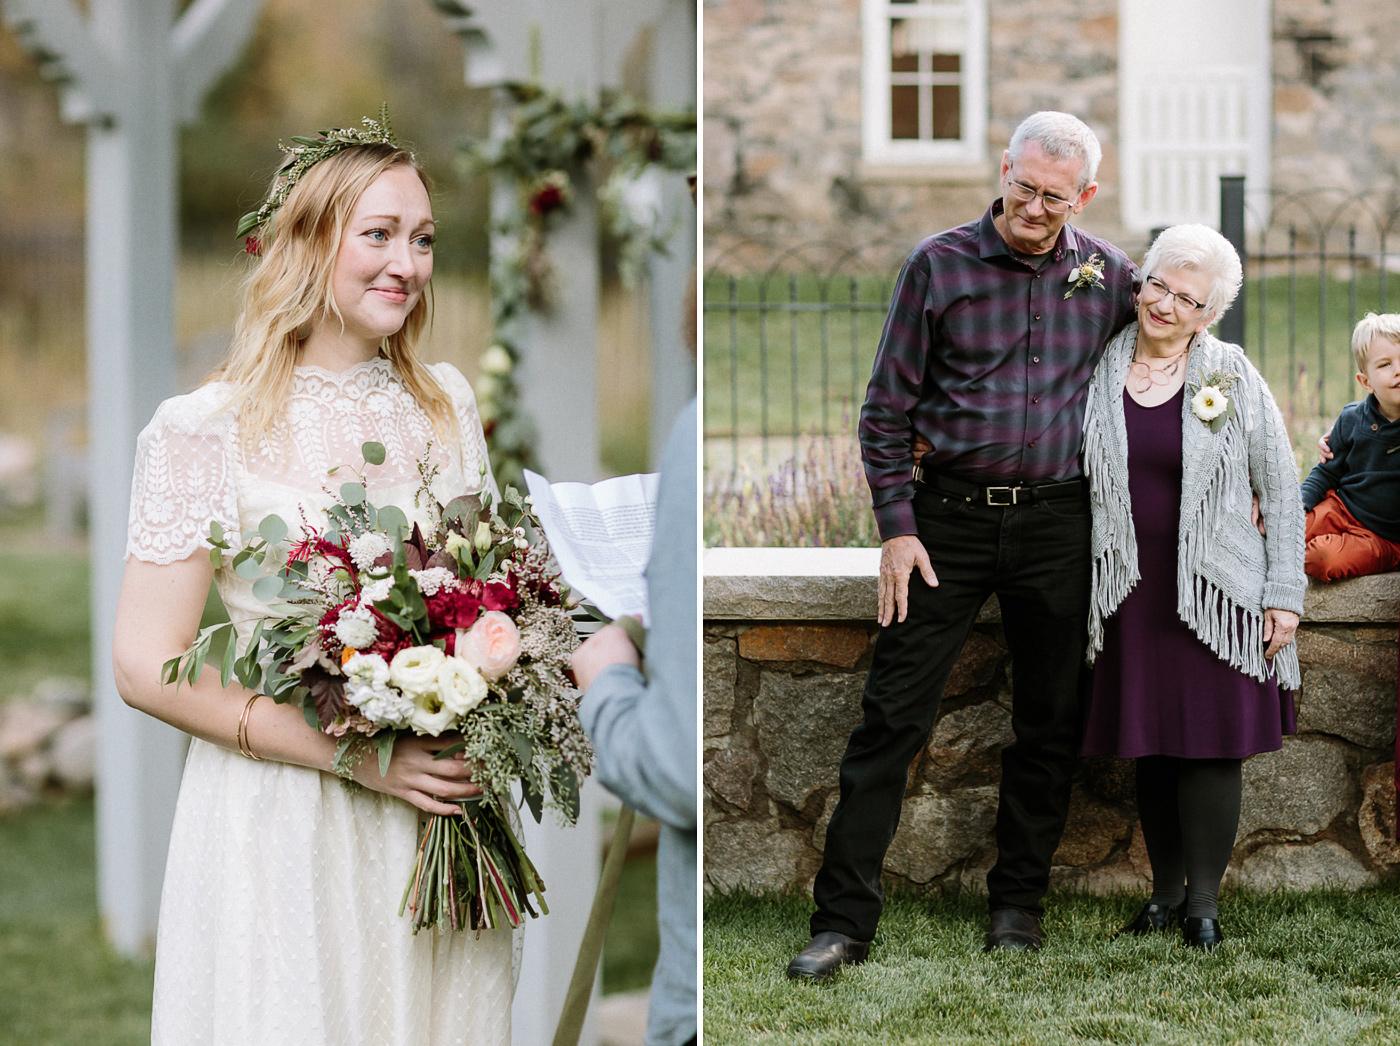 Bride smiling during vows